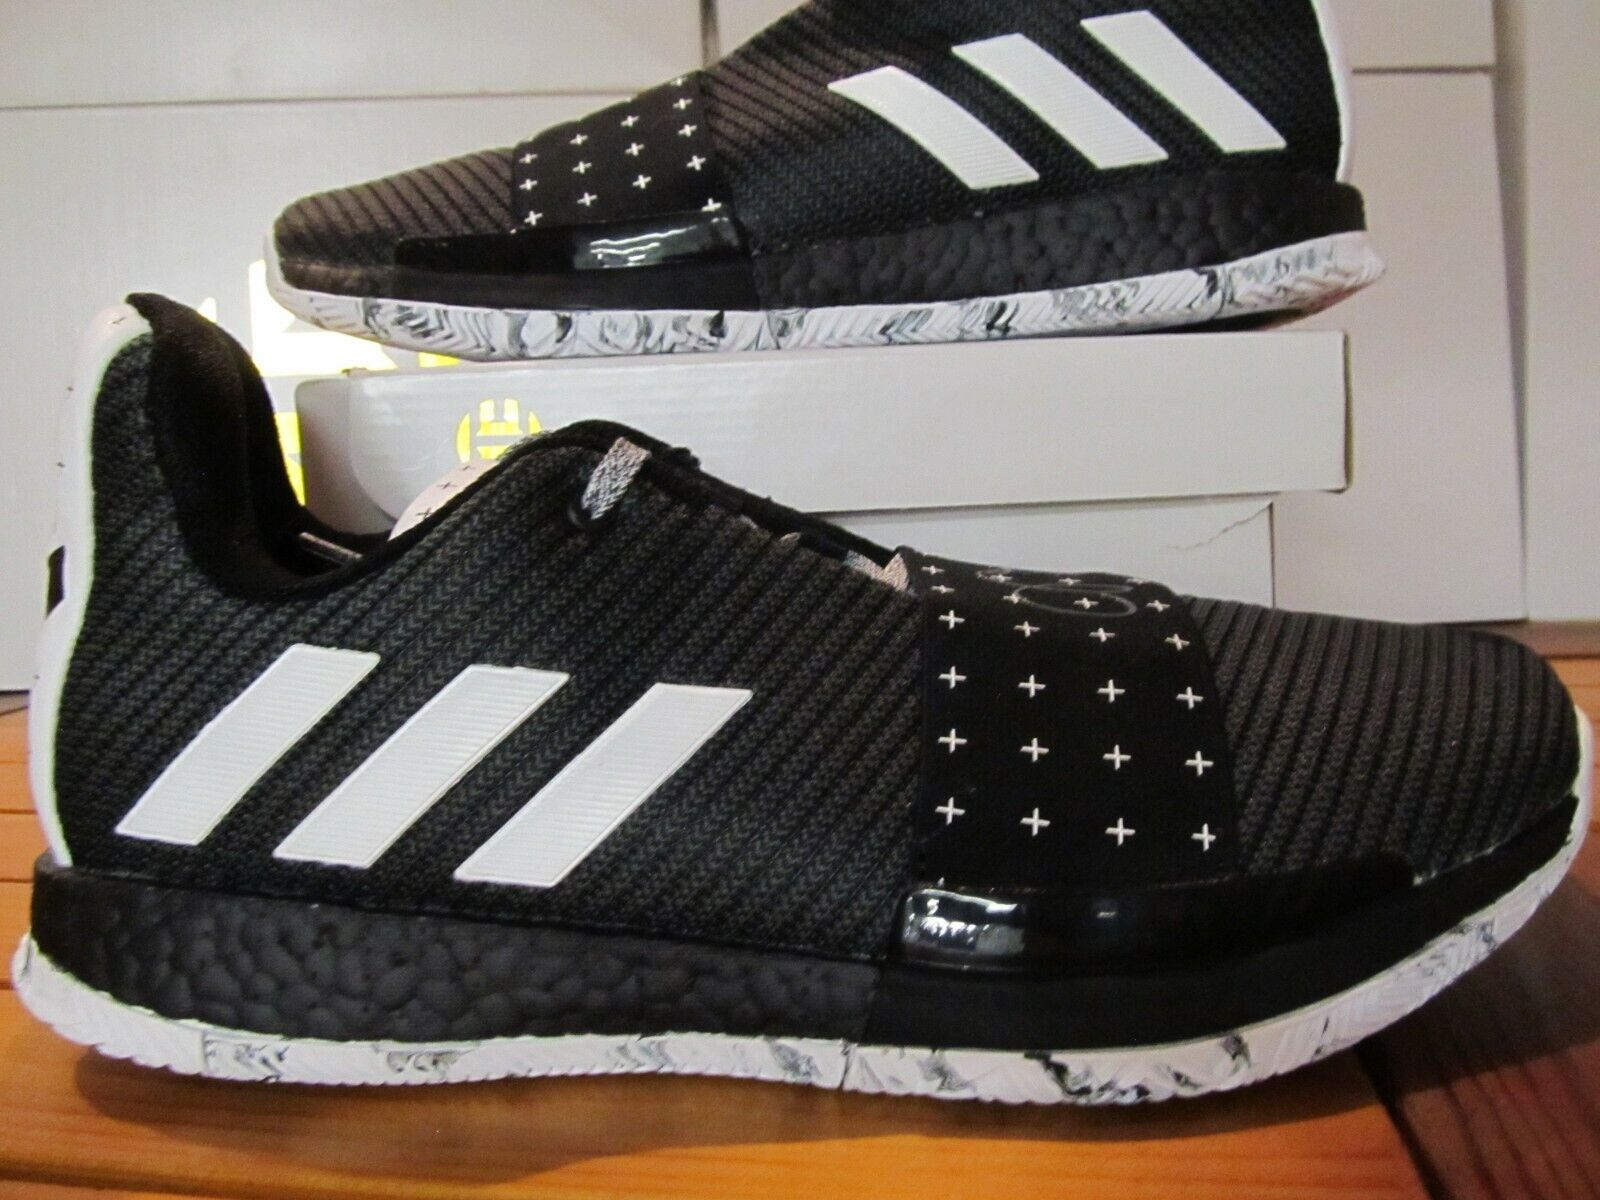 Adidas Endurecer Vol.3 Cosmos whiteo black Impulsar 9 BB7723 James MVP Muy red